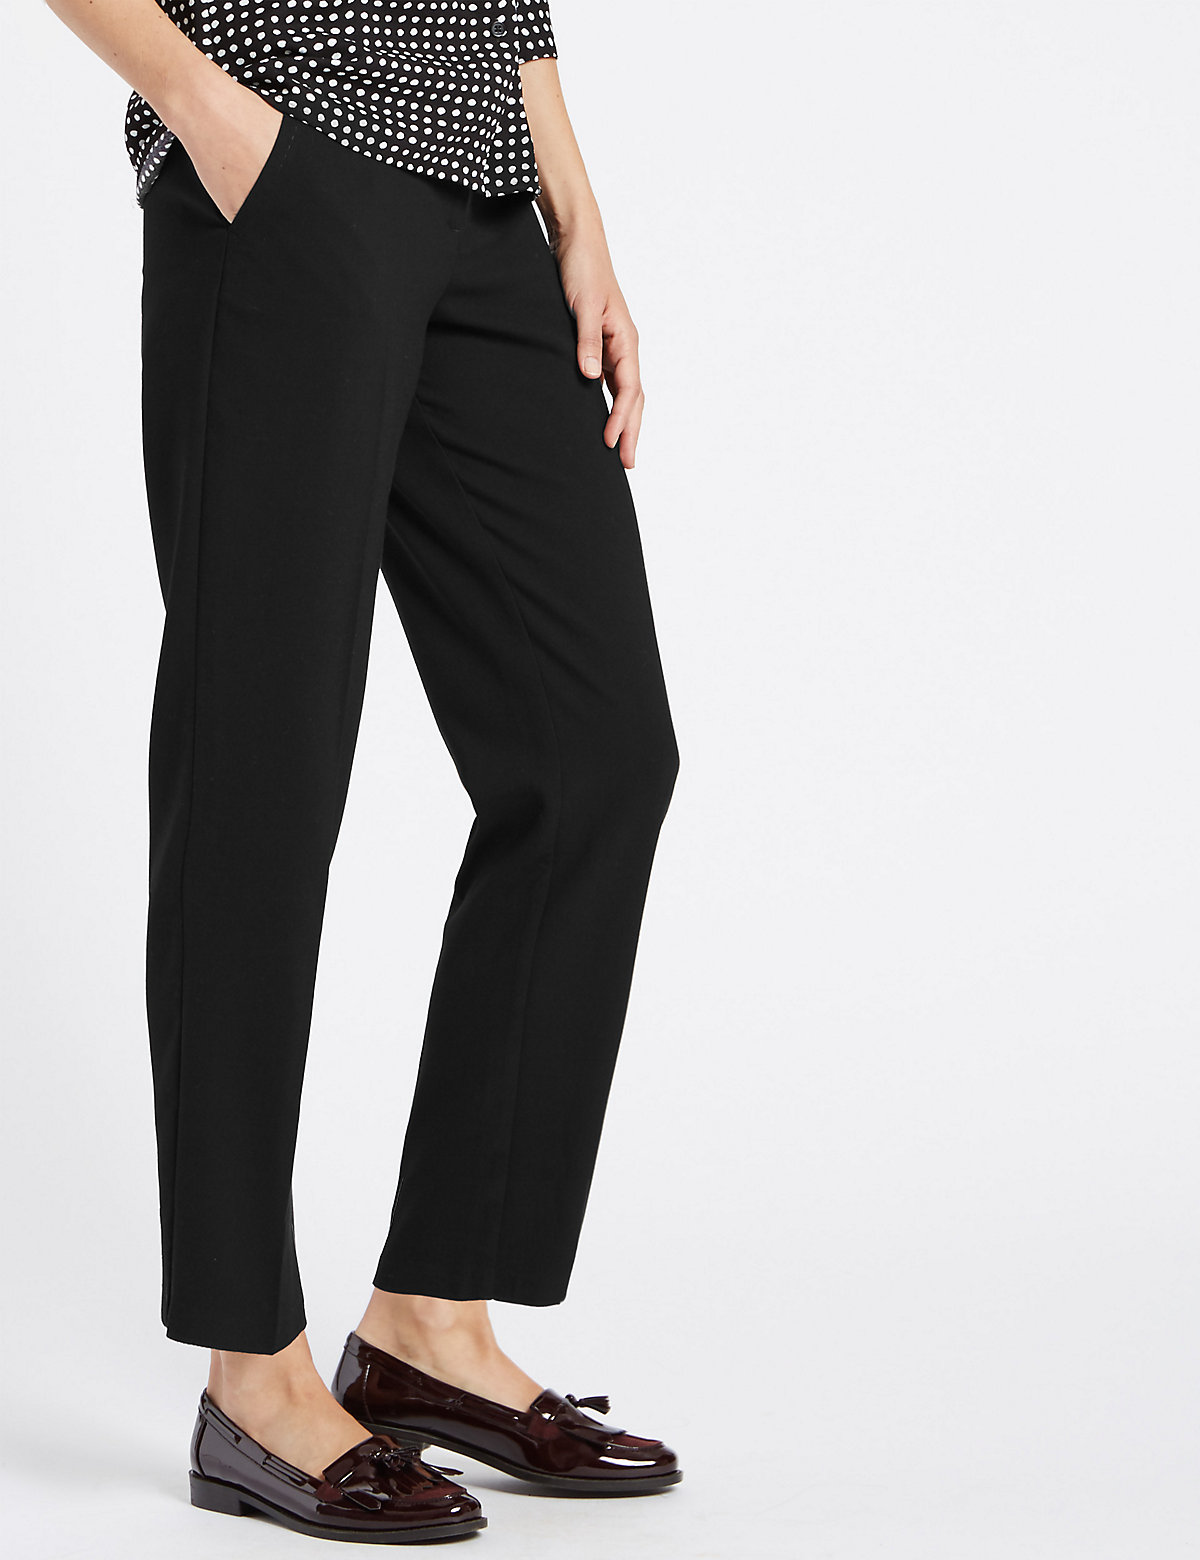 Classic Straight Leg Welt Pocket Trousers